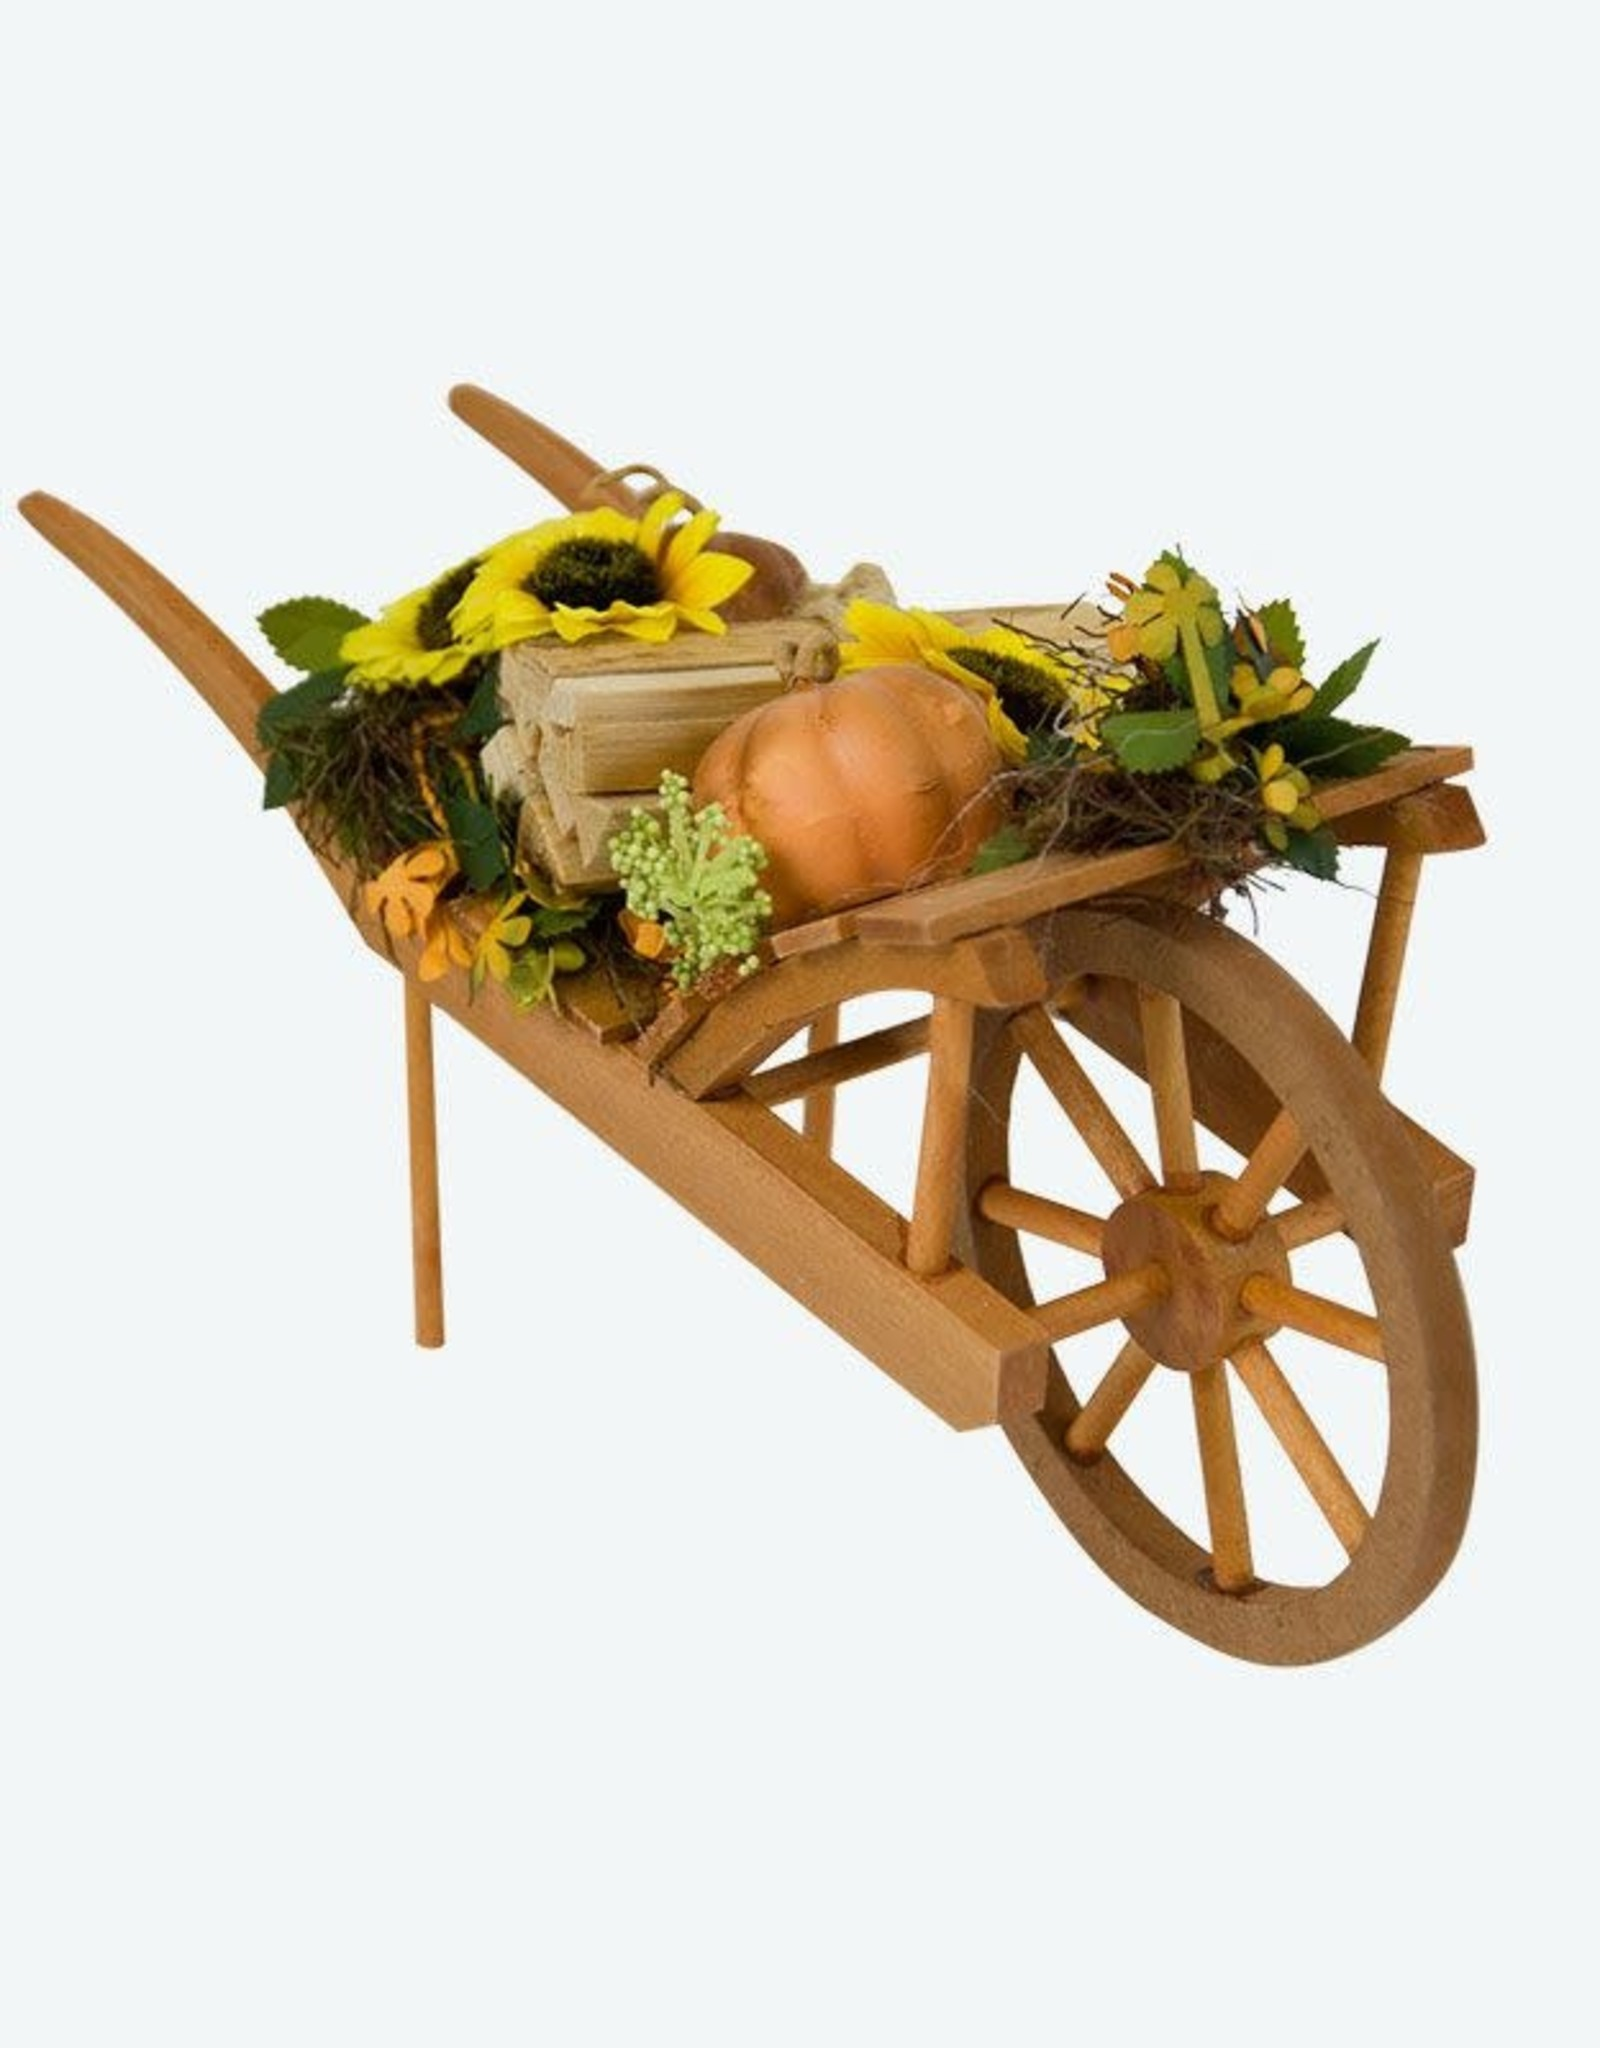 Harvest Wheelbarrow